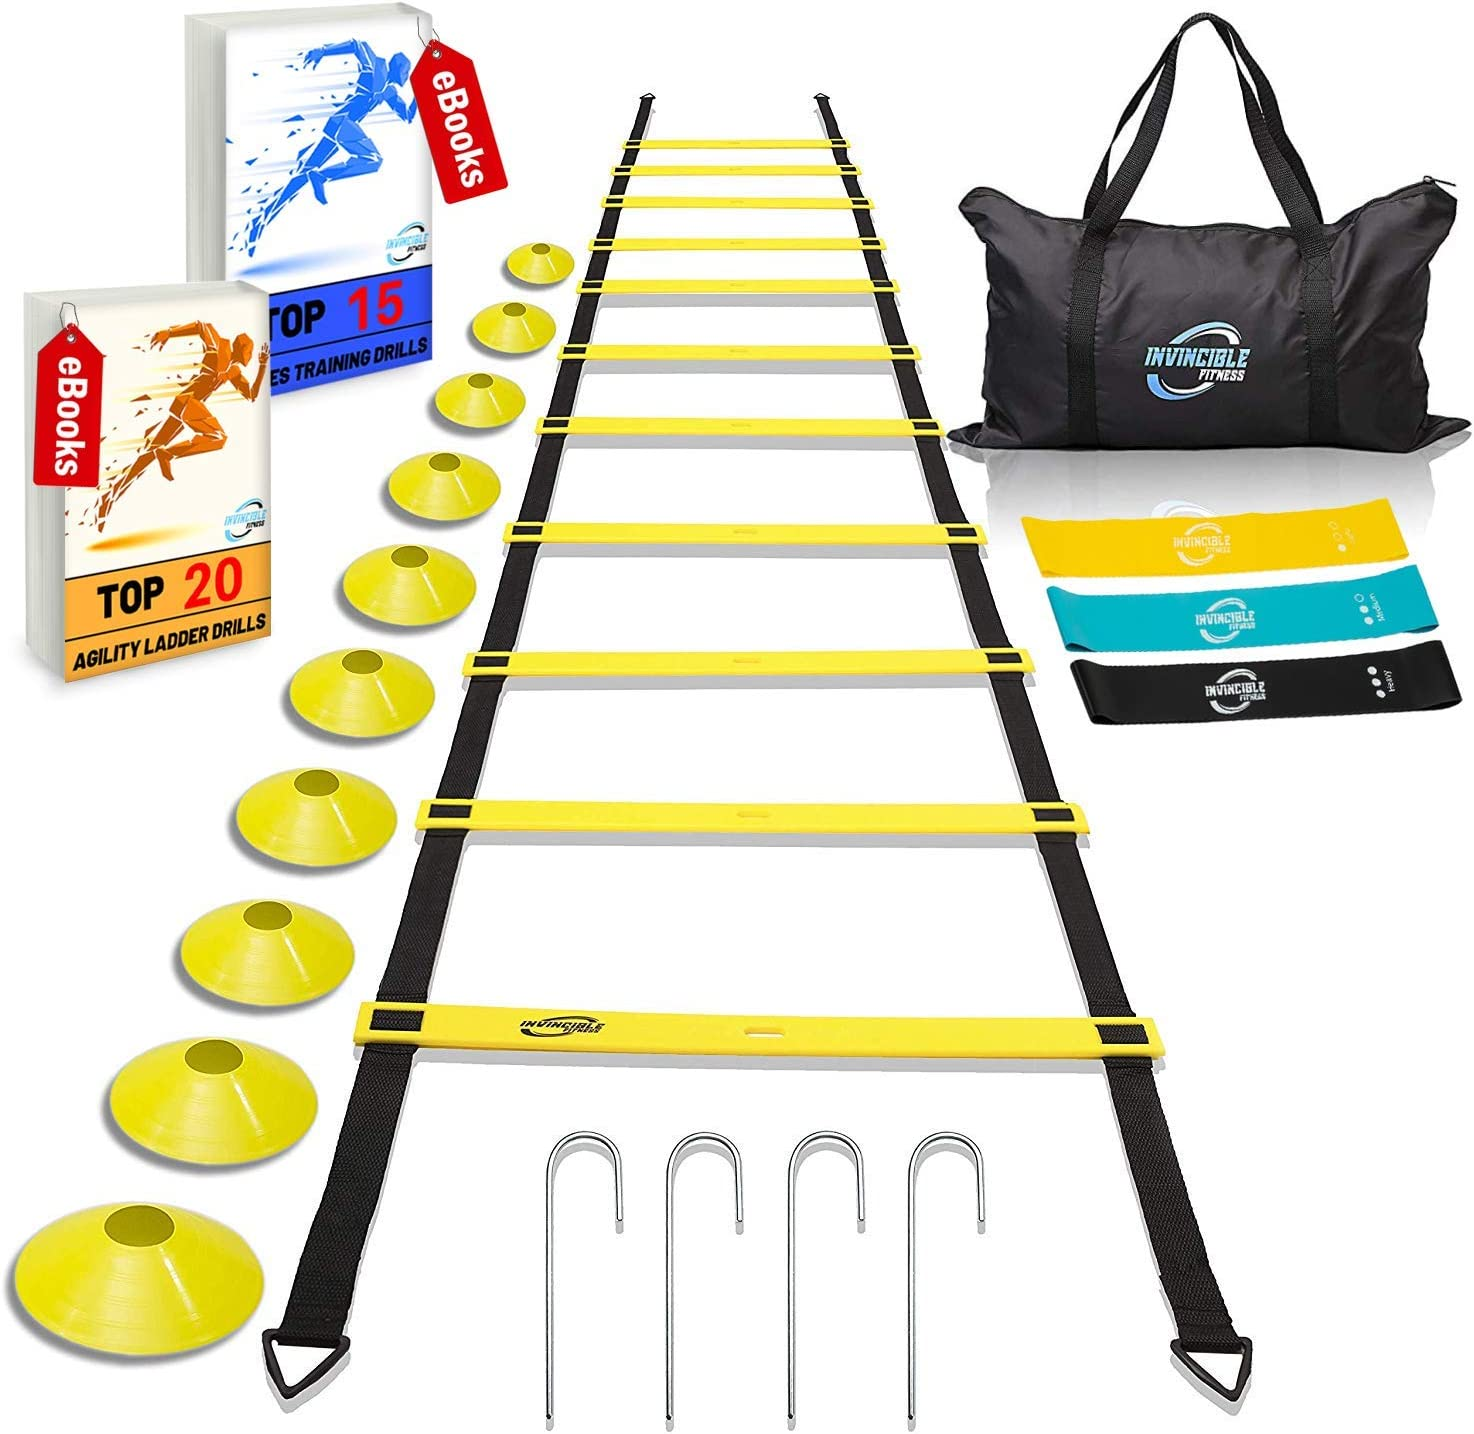 Invincible Sales Fitness Agility 2021 new Ladder Equipment Training Set Improv